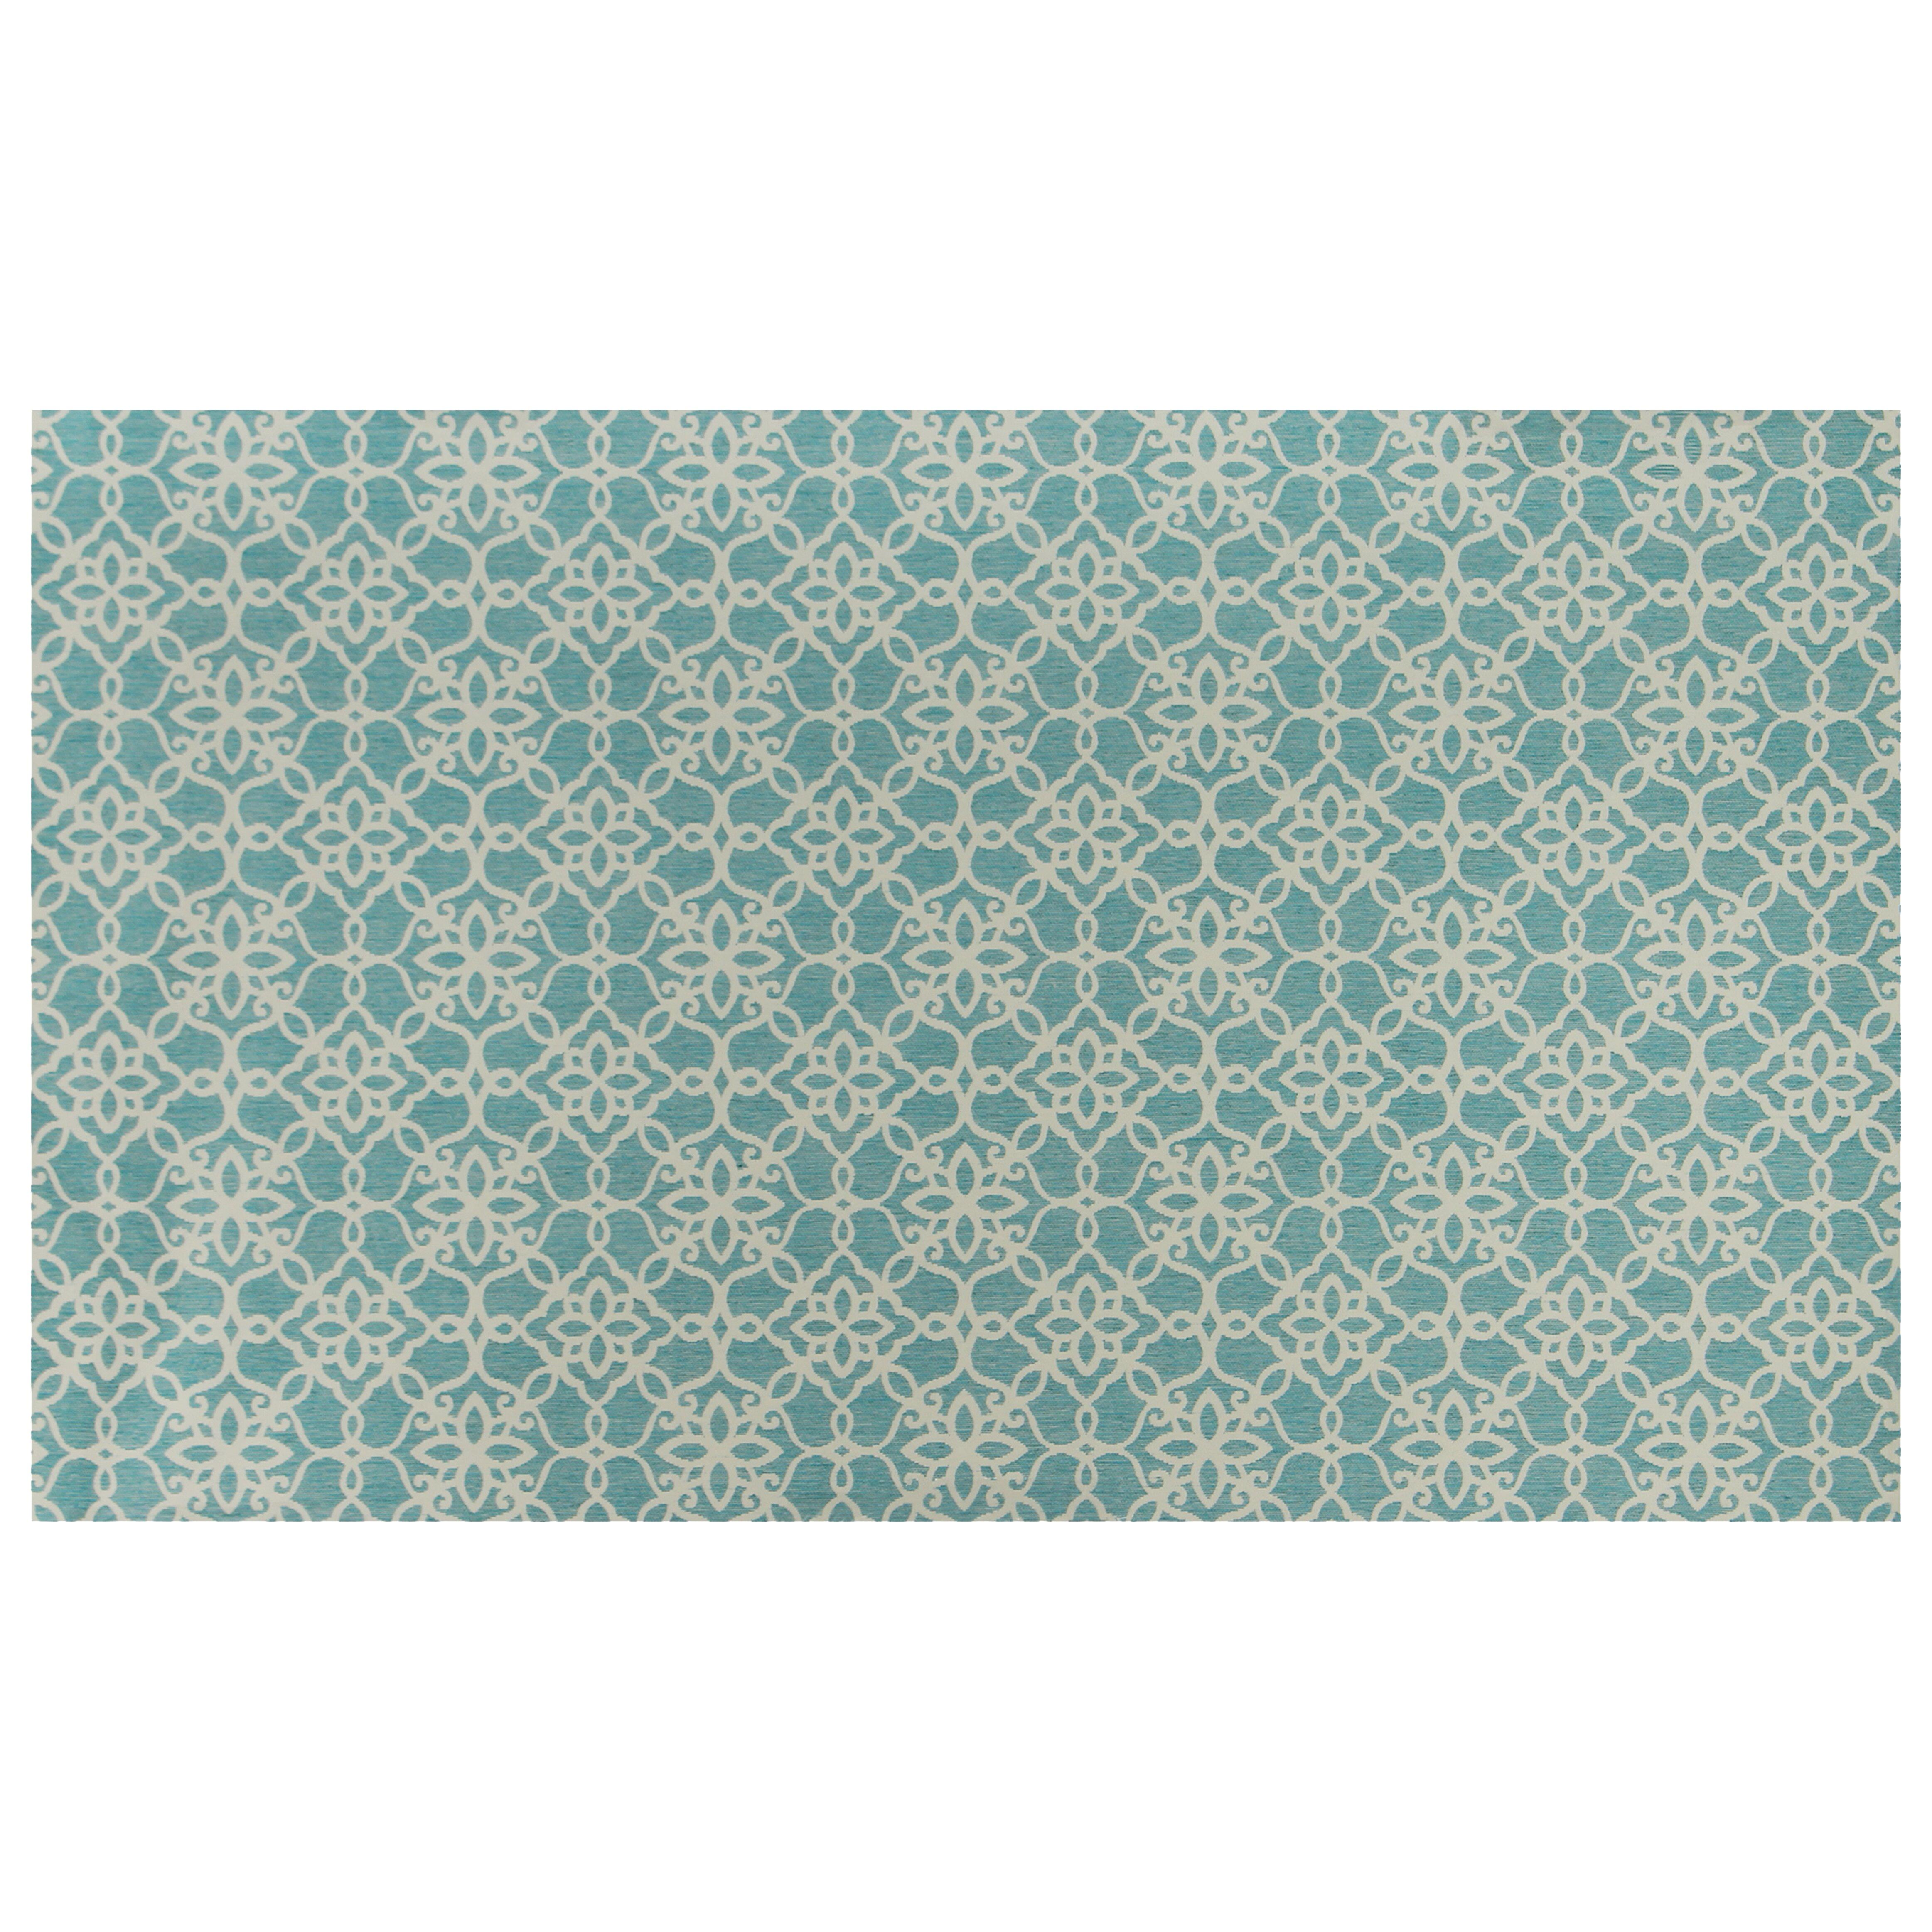 ruggable aqua blue and white area rug reviews wayfair. Black Bedroom Furniture Sets. Home Design Ideas